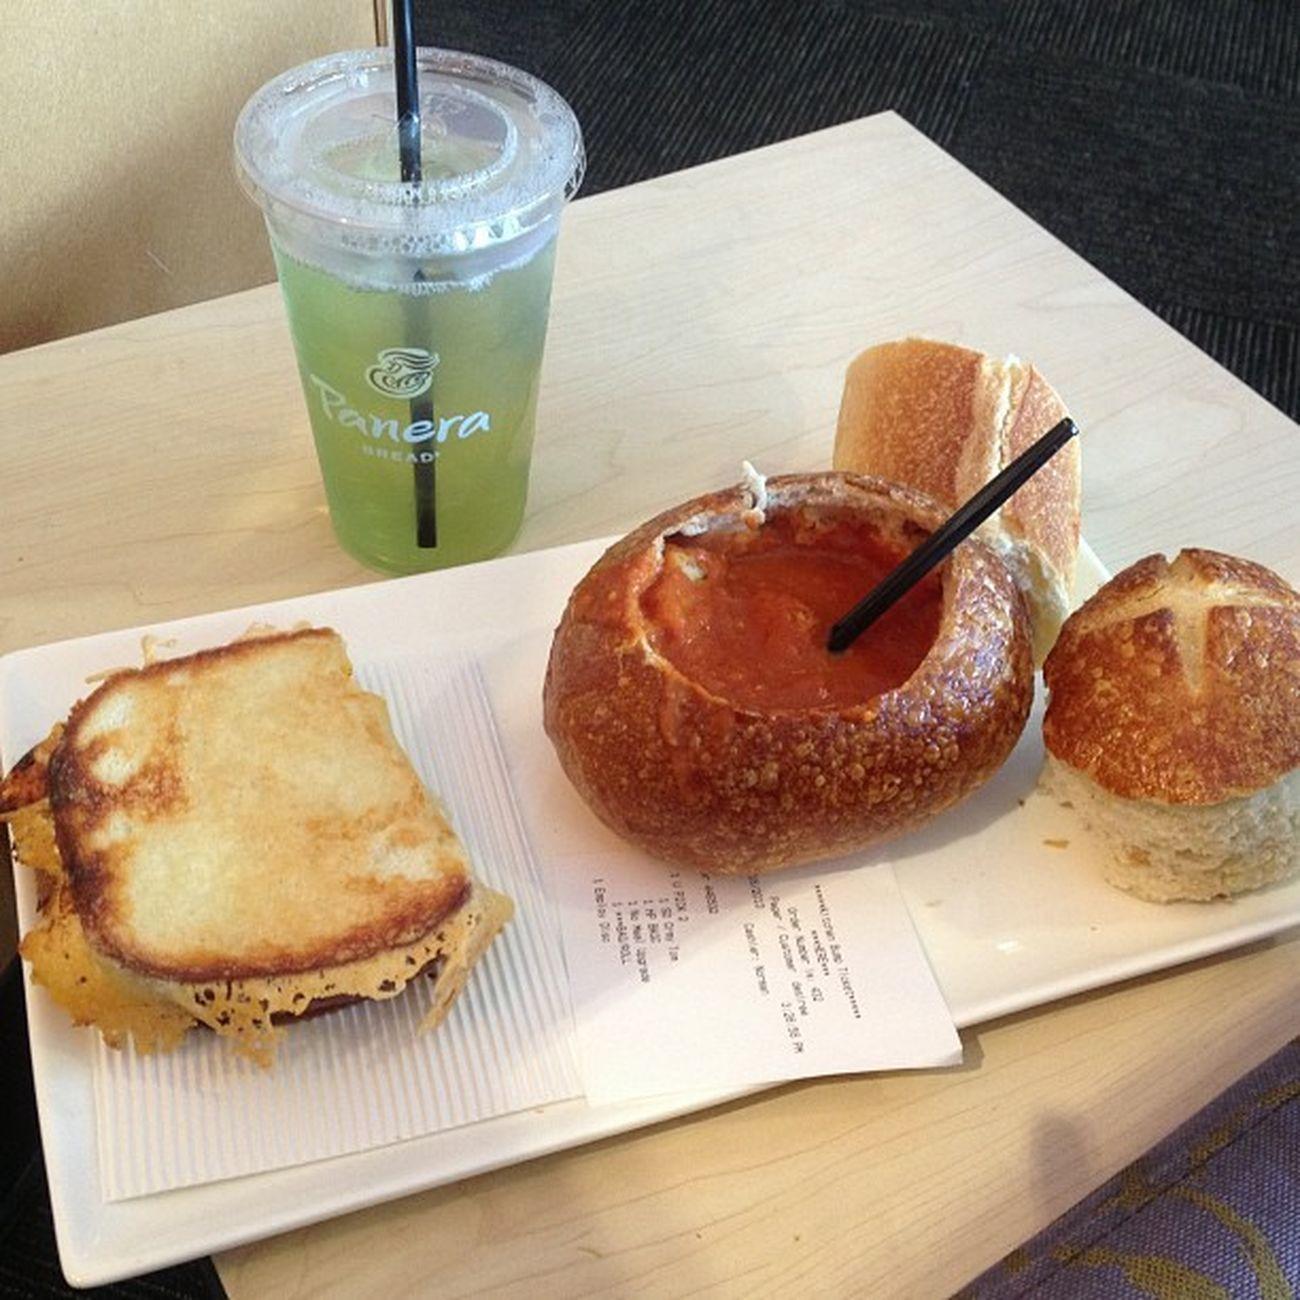 on break eating some bomb! Bigkidzgrilledcheese Creamytomatoe